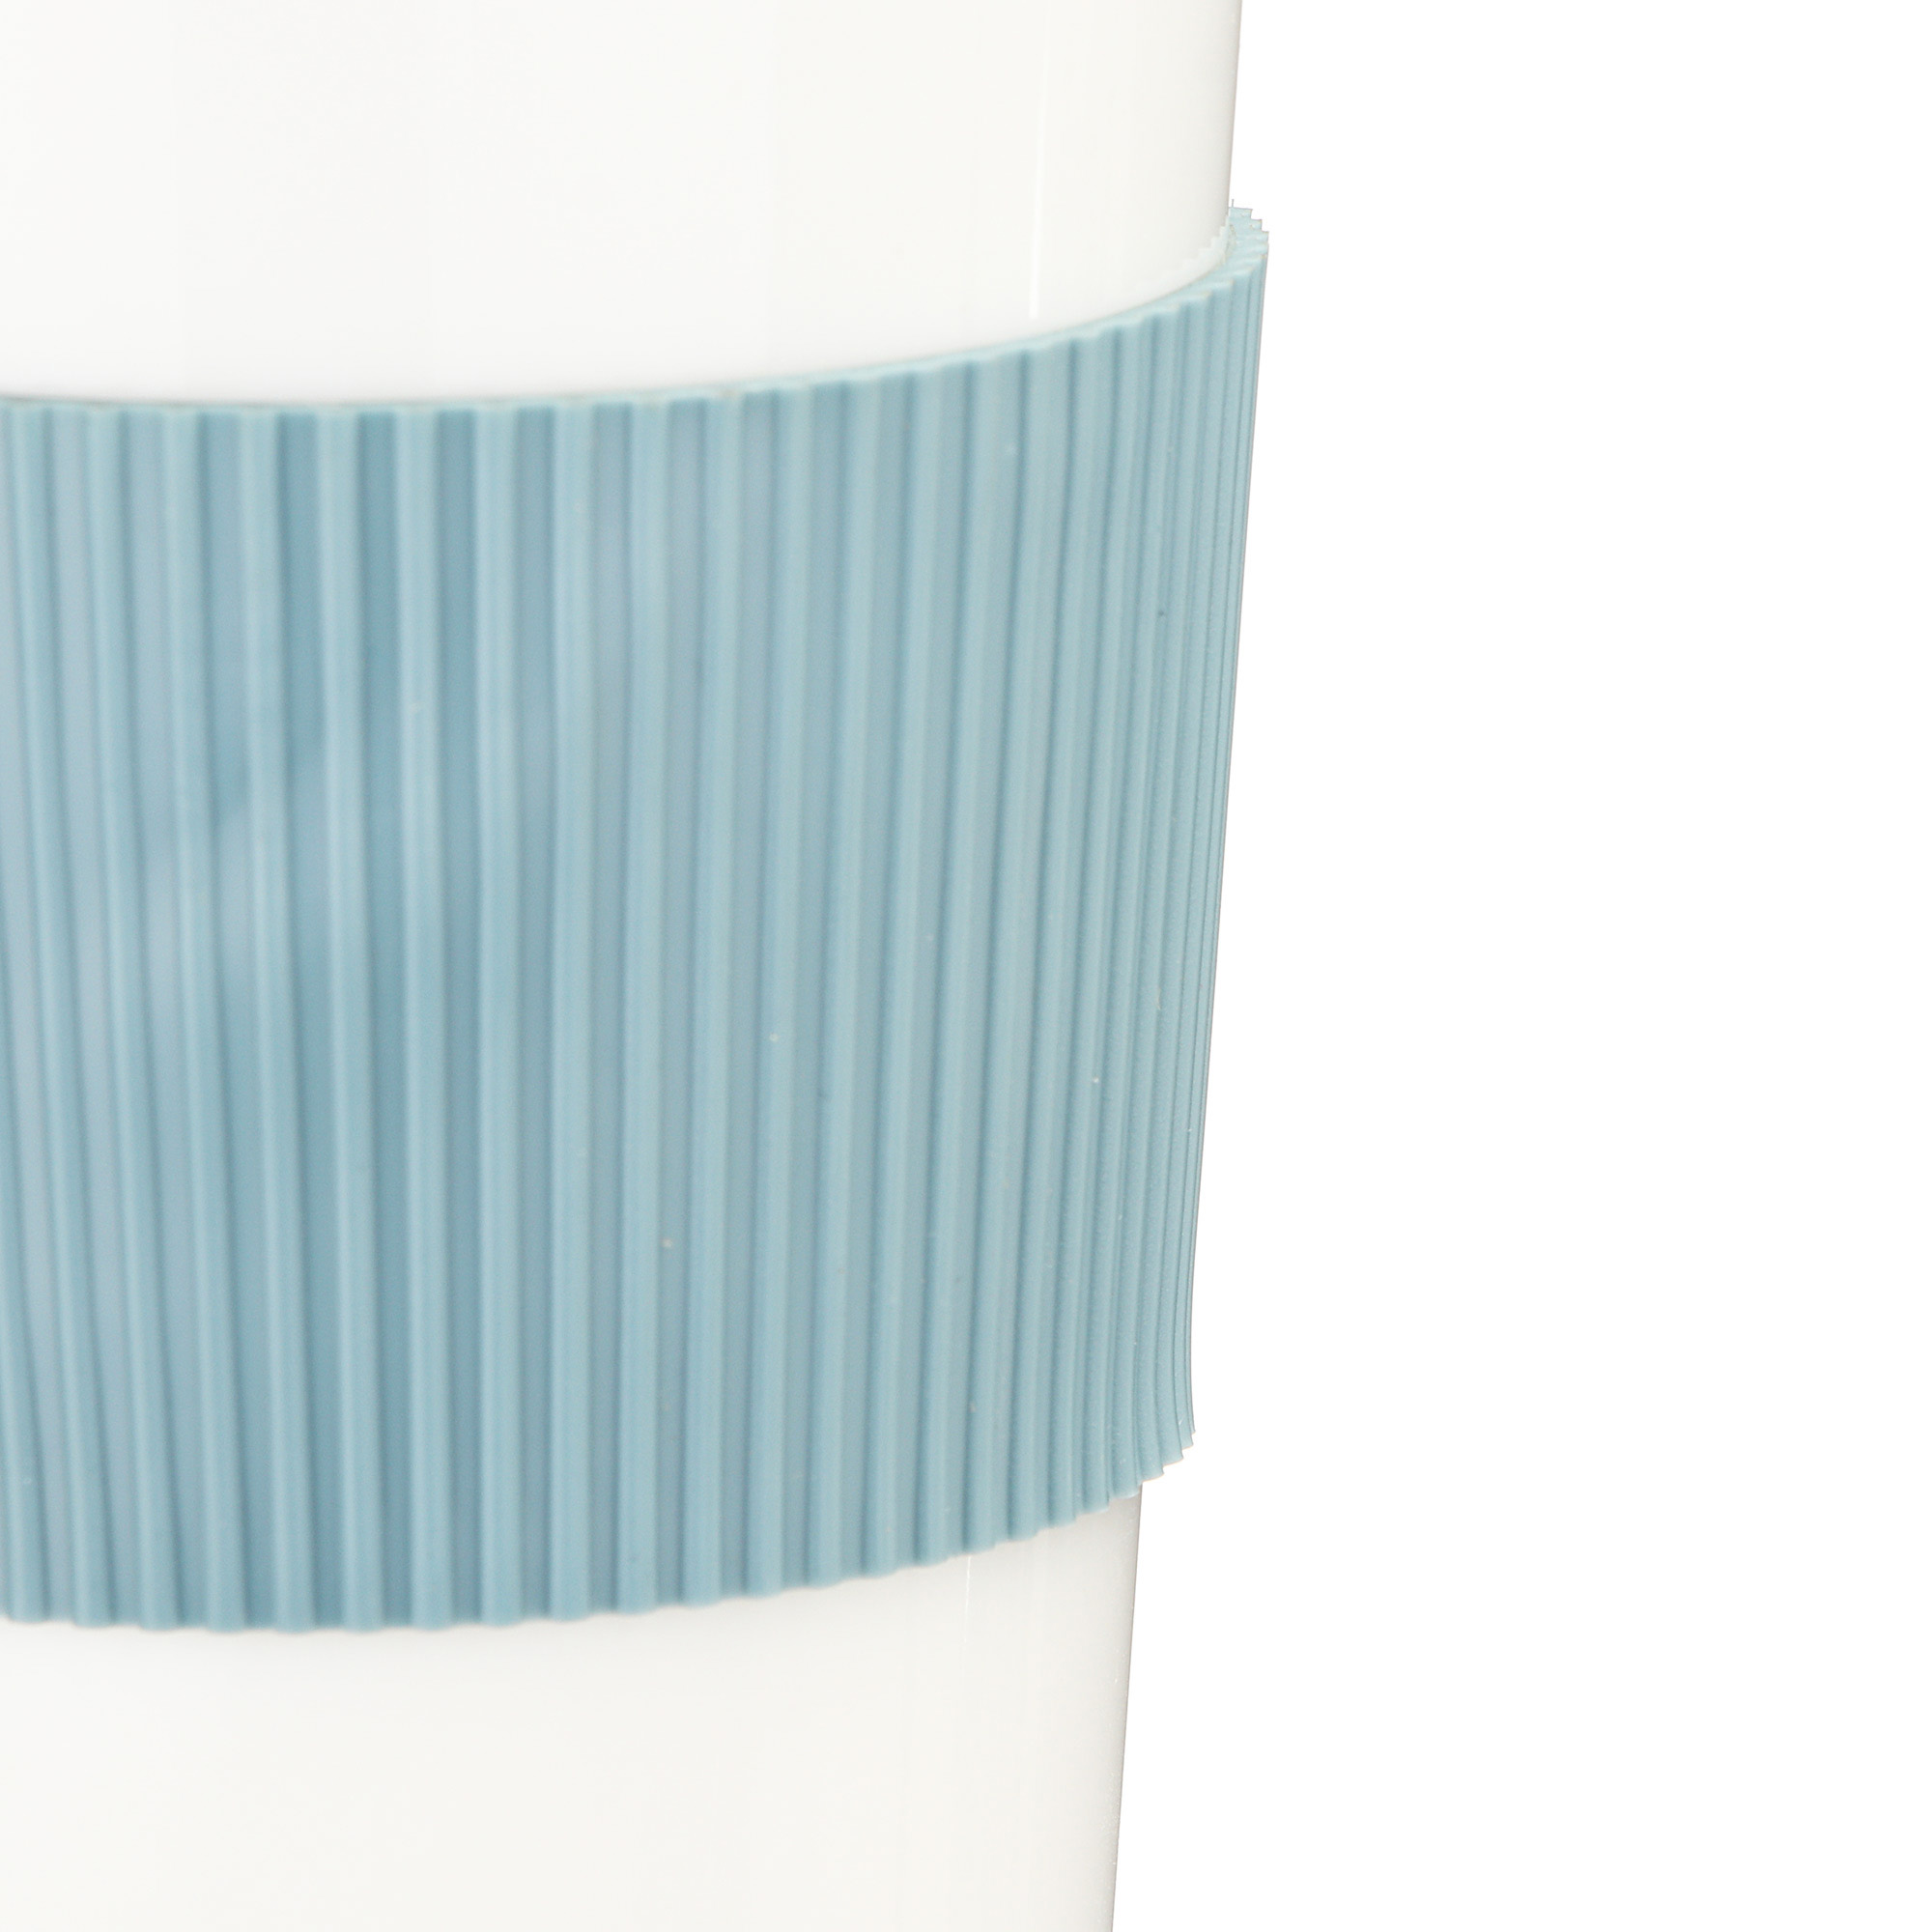 Термокружка Koopman tableware в ассортименте 500 мл